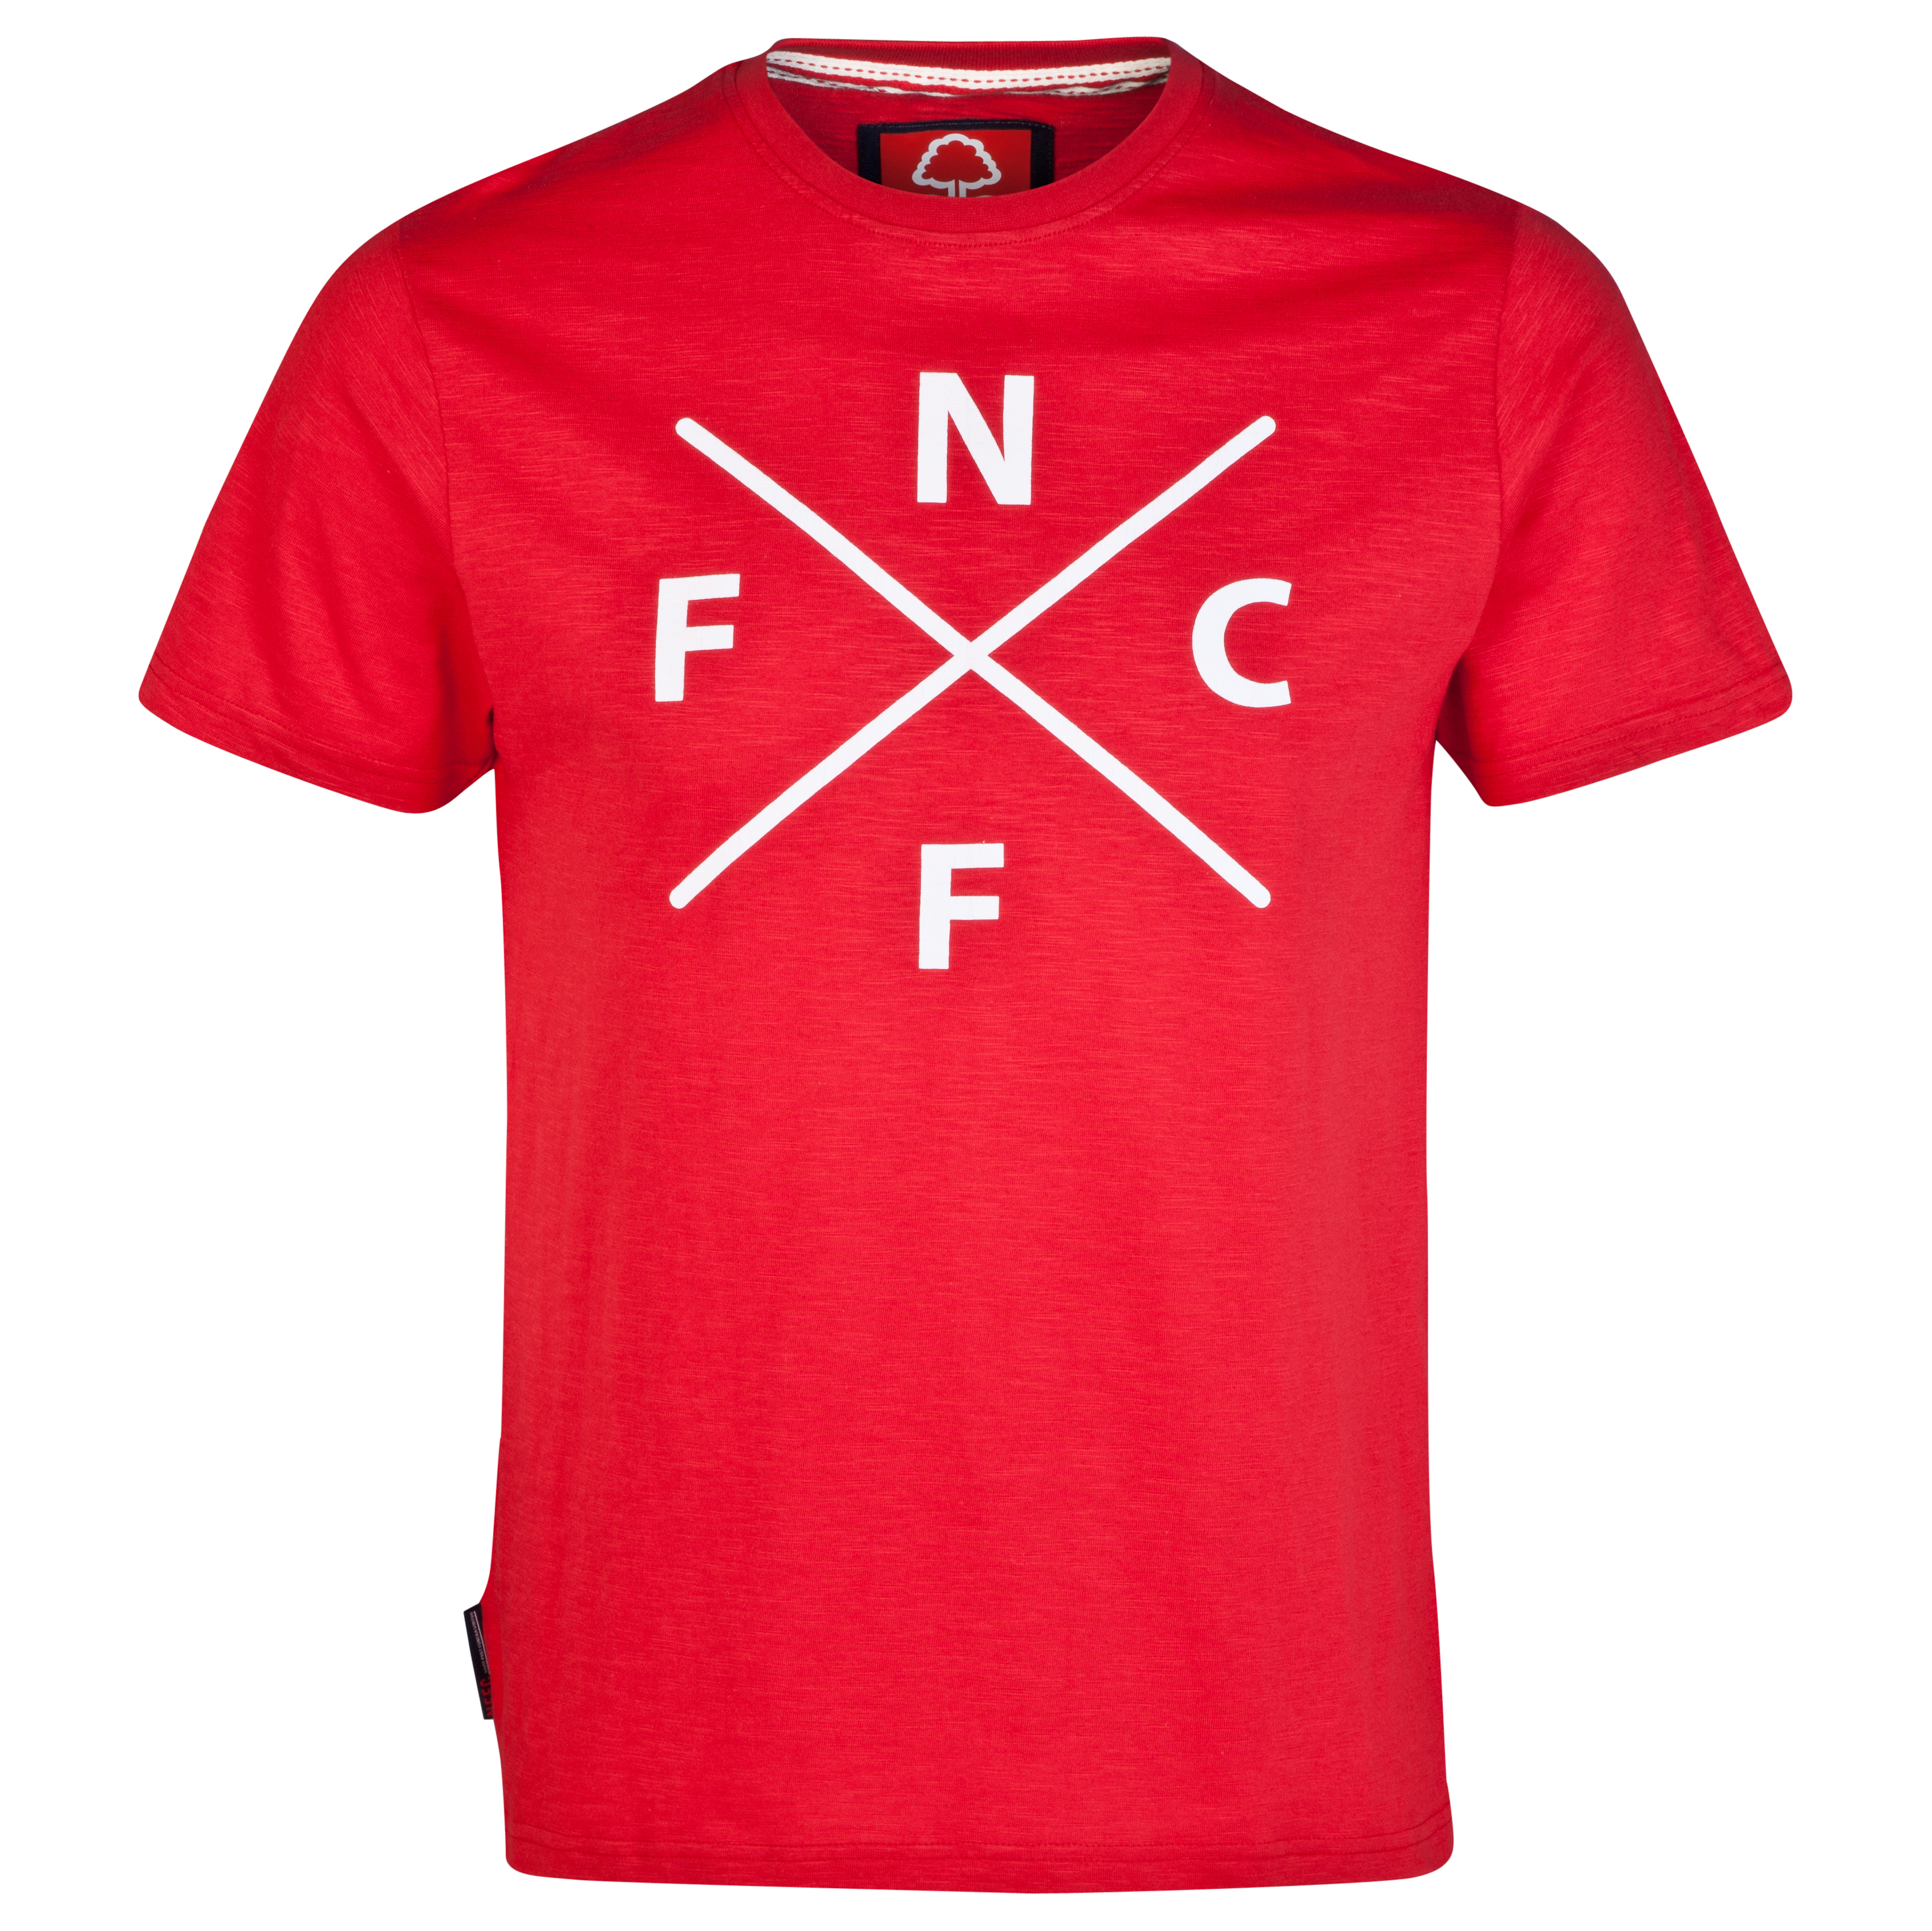 Nottingham Forest Code T-Shirt-Older Boys Red